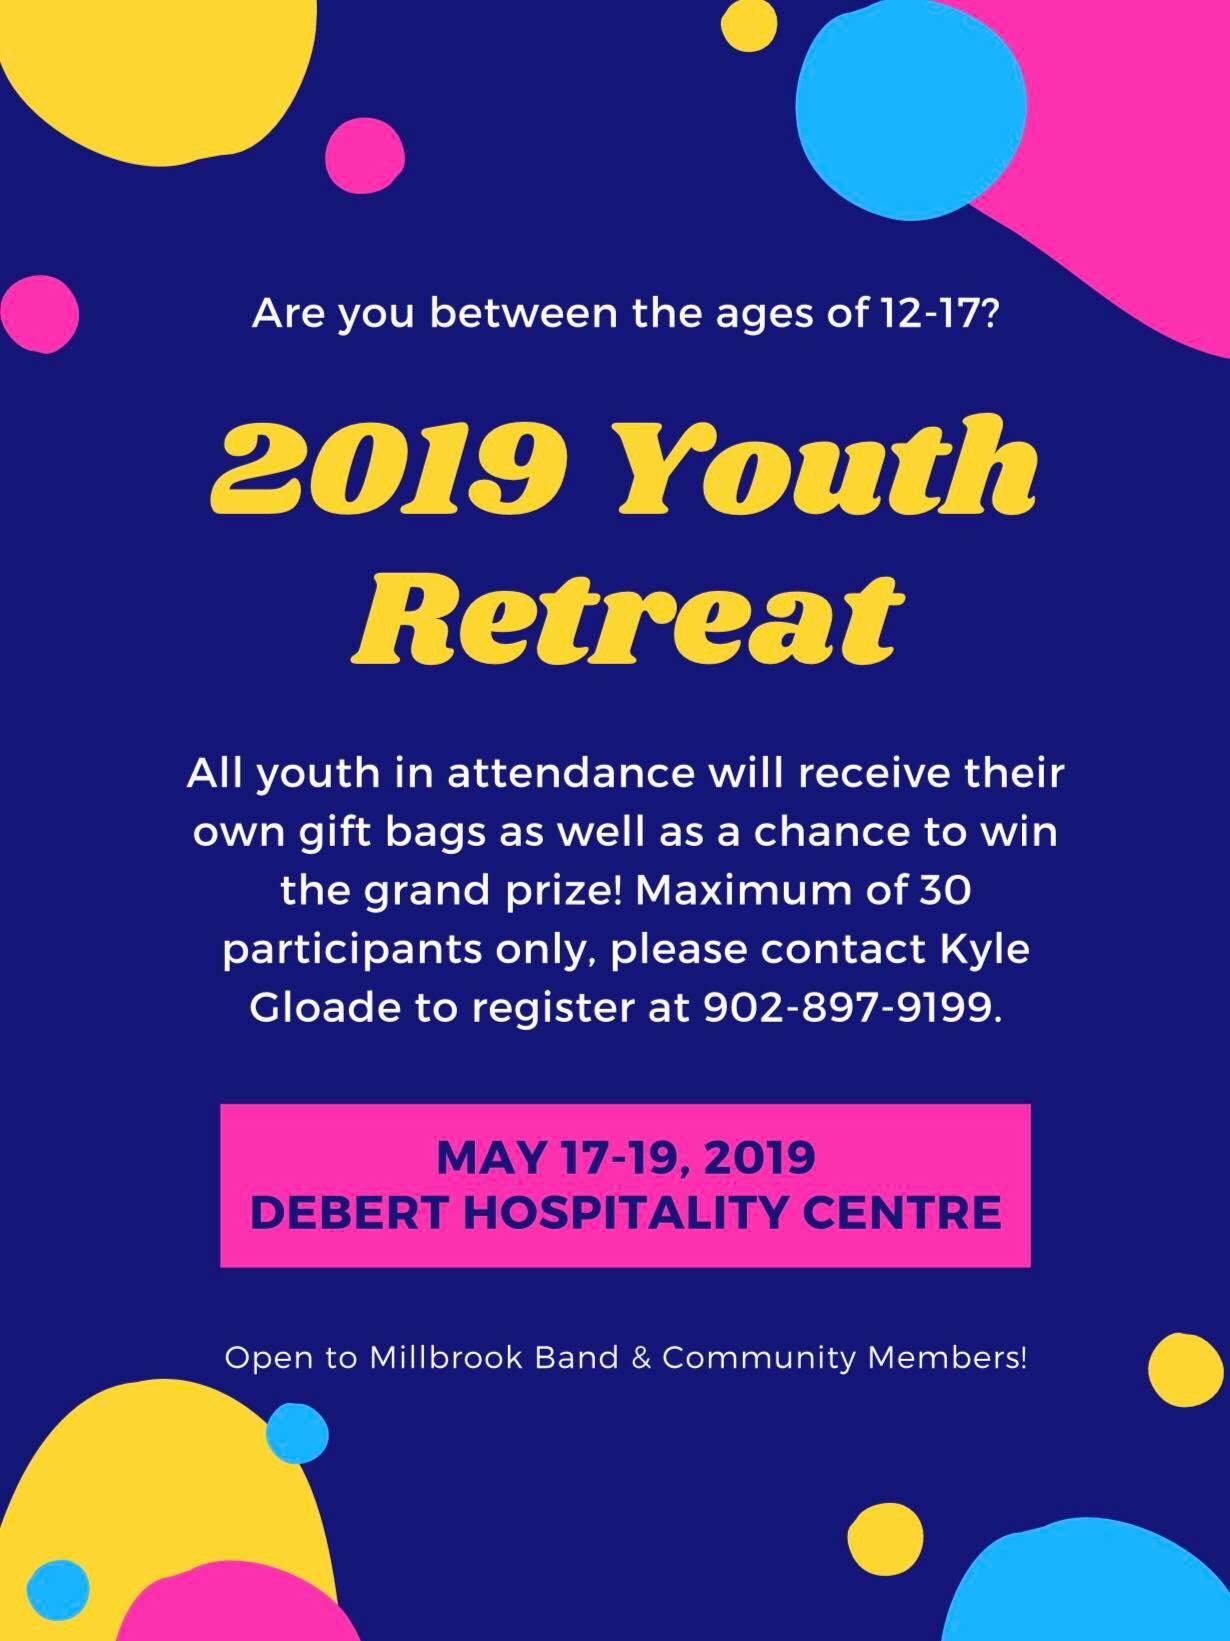 2019 Youth Retreat